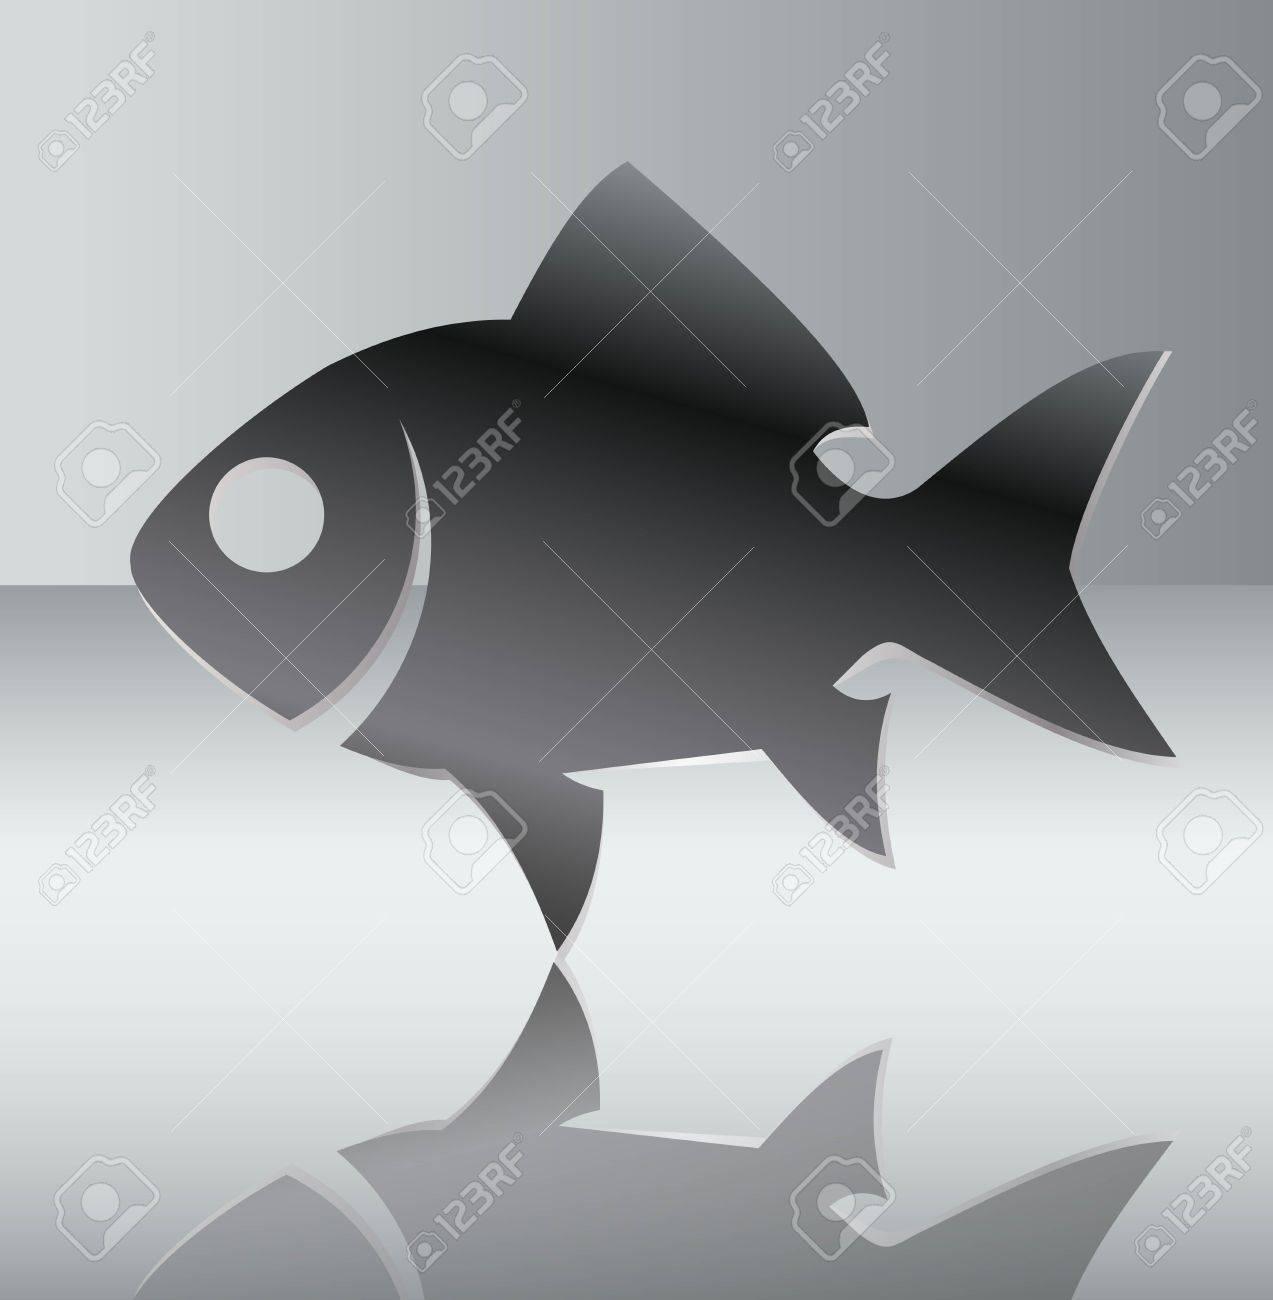 Silhouette of fish illustration Stock Vector - 12492002